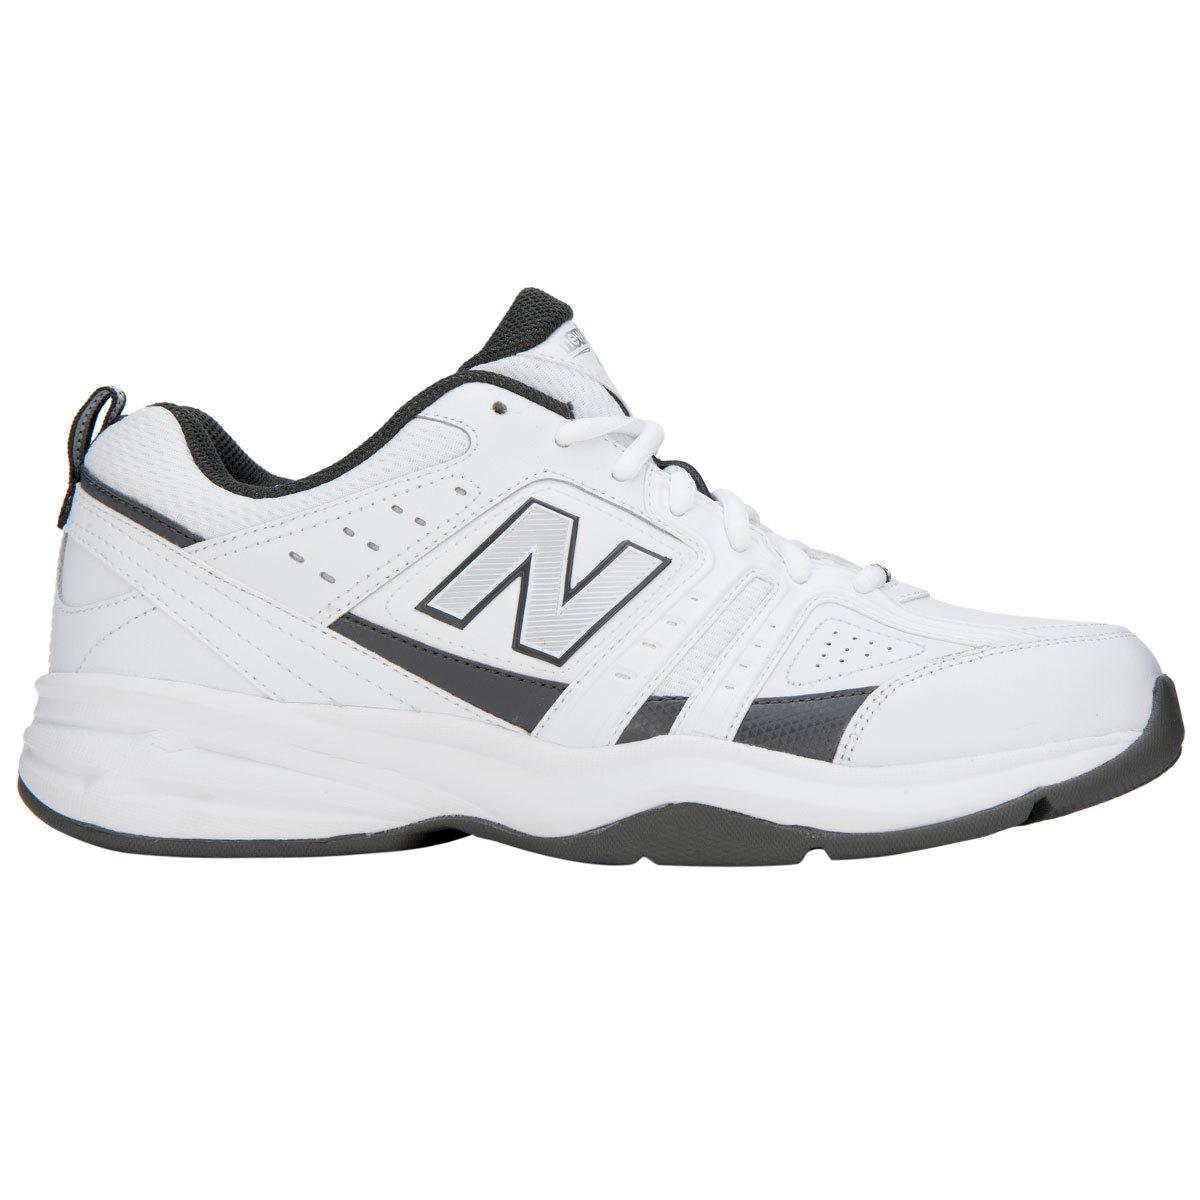 1fcc1407 NEW BALANCE Men's MX409WG2 Sneakers, Wide Width 4E - Bob's Stores